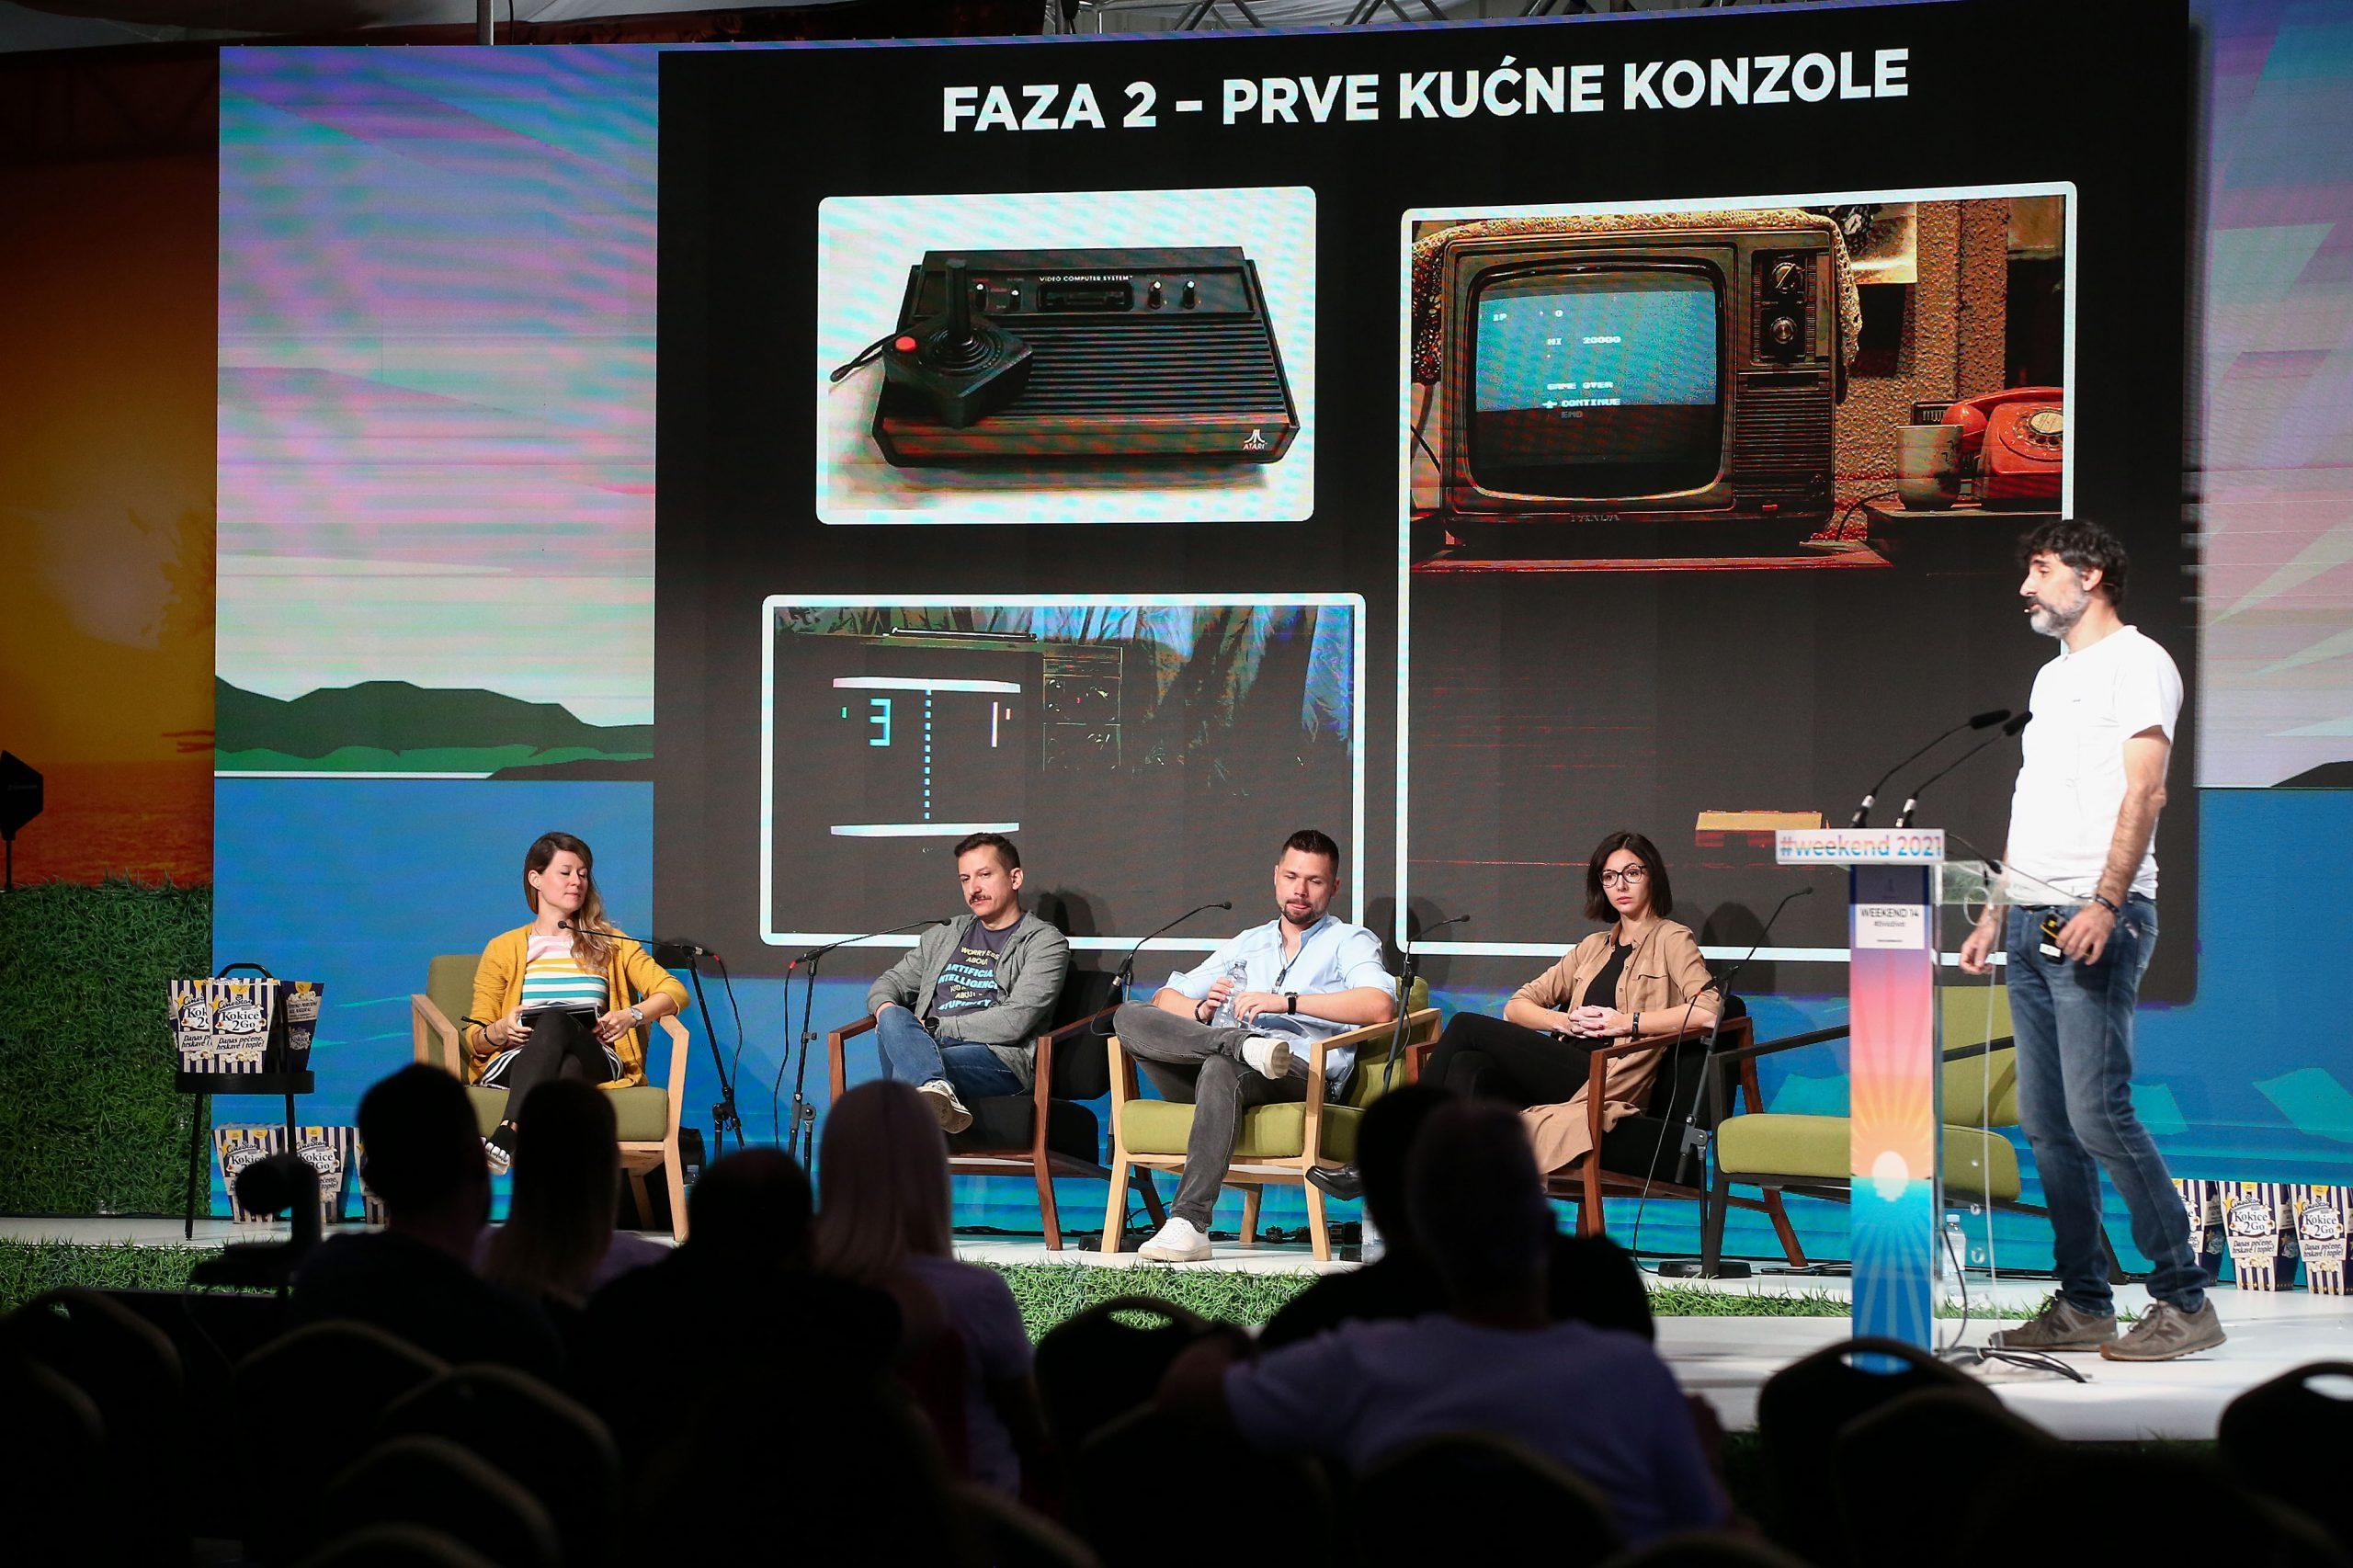 Od gaminga, aktivizma i sporta do žustre rasprave o medijima na 14. Weekend Media Festivalu